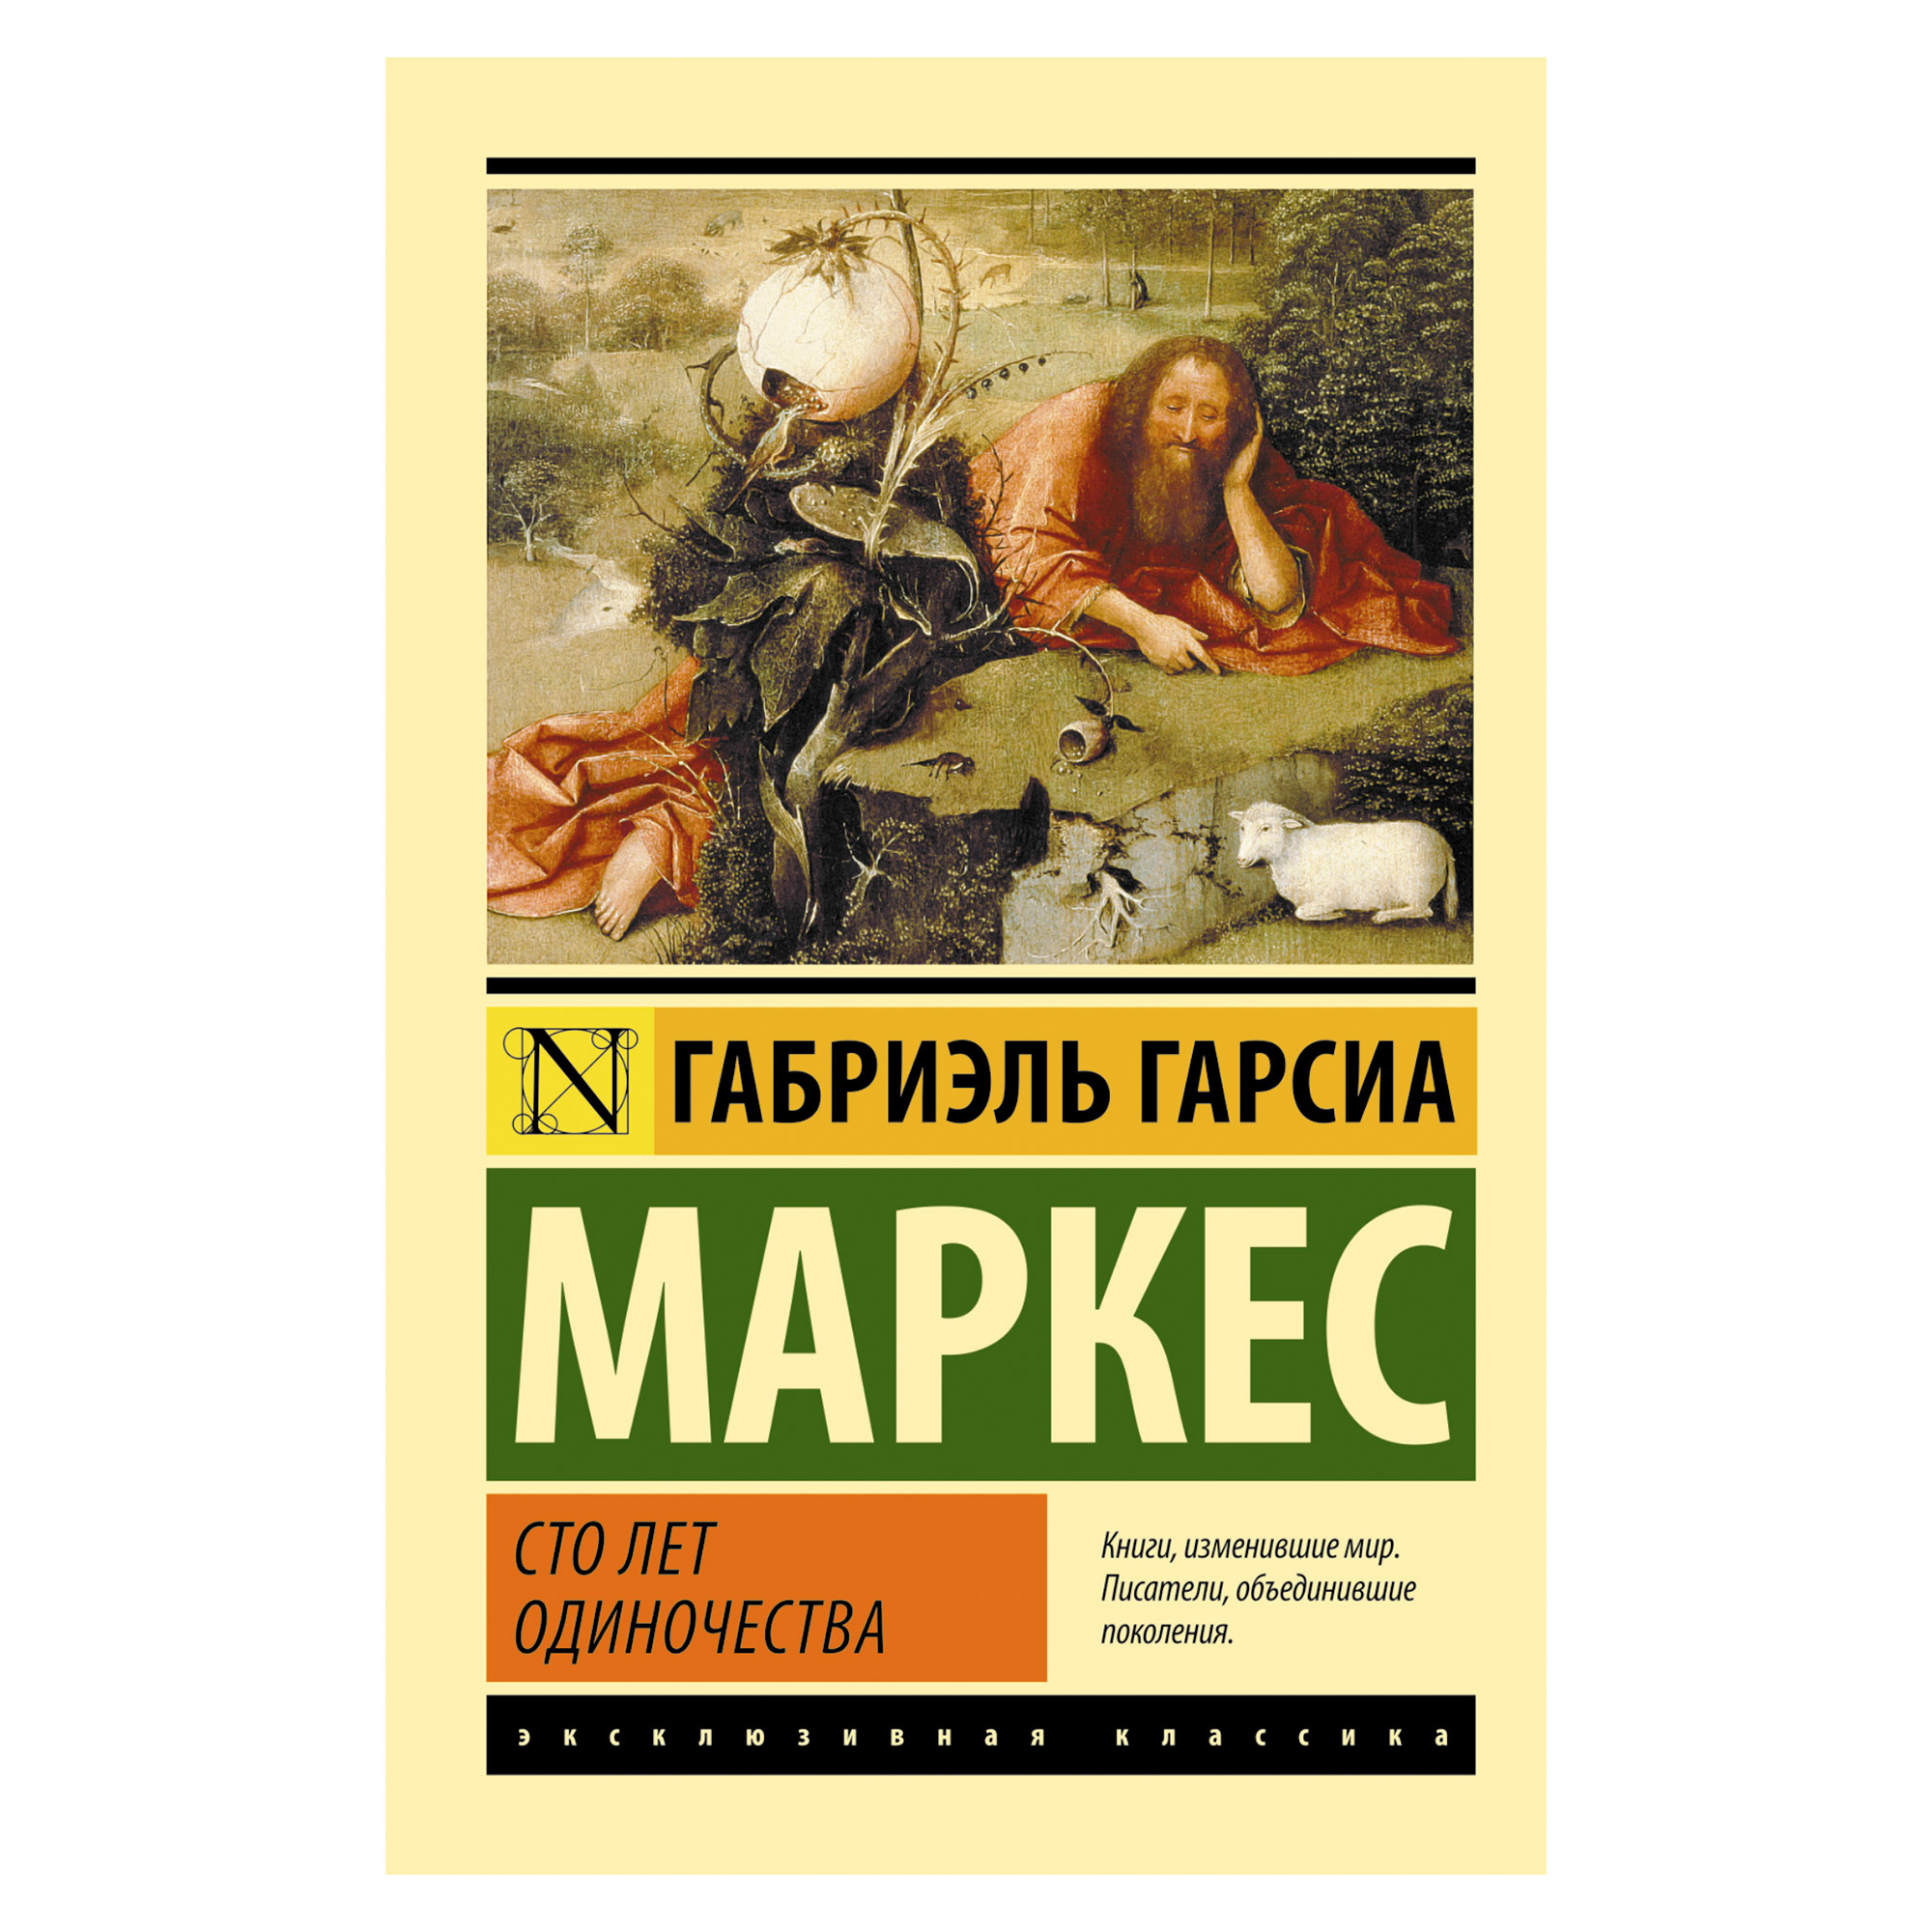 Книга АСТ Гарсиа Маркес Г. Сто лет одиночества гарсиа маркес г габриэль гарсиа маркес комплект из 3 книг